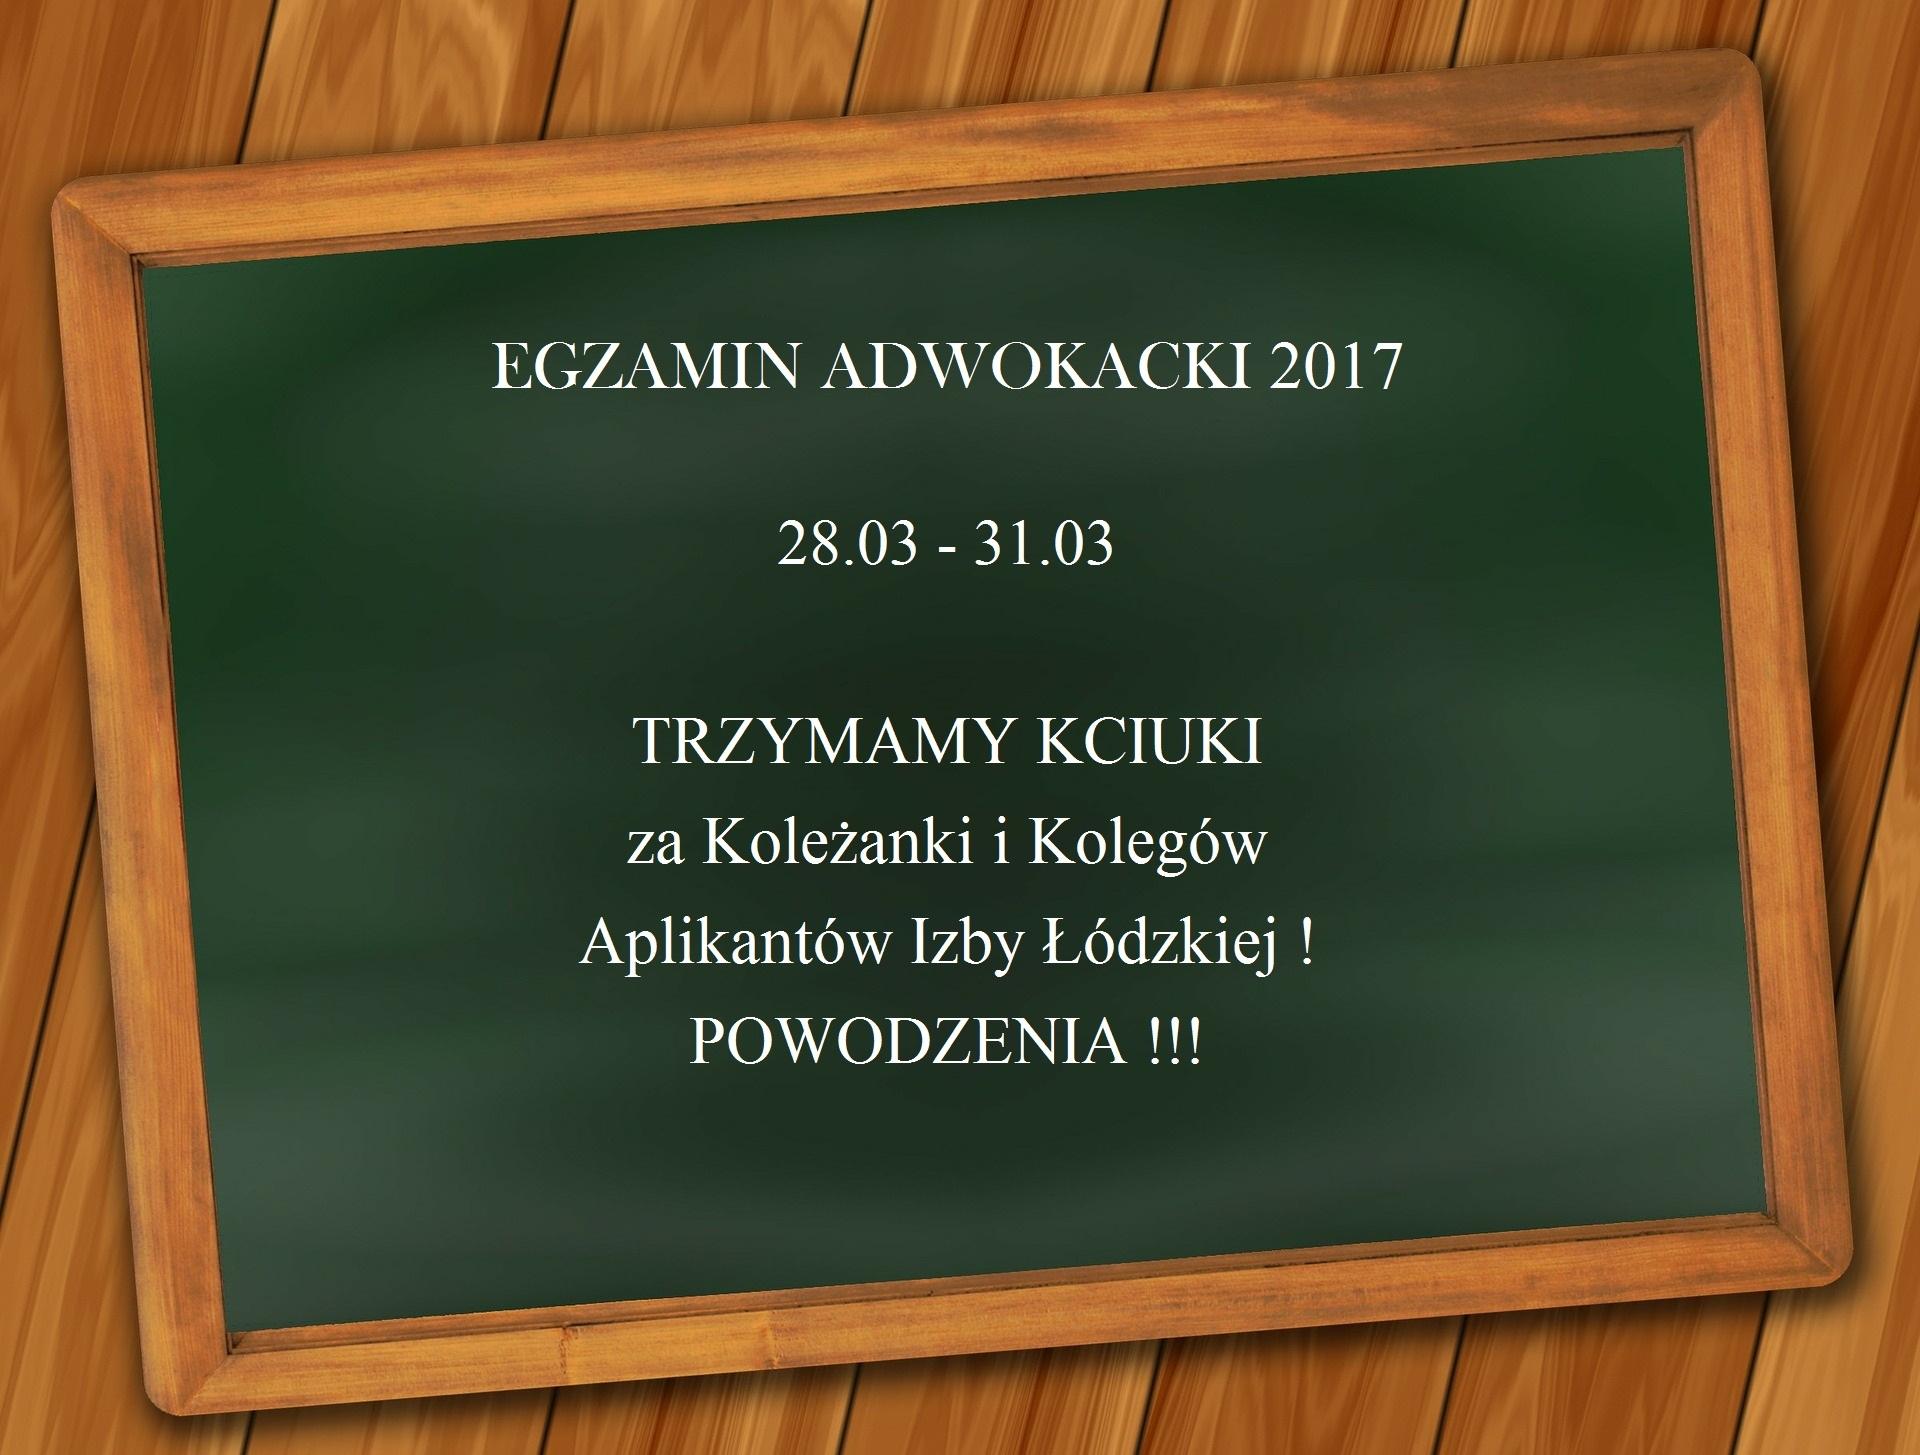 http://lodz.adwokatura.pl/wp-content/uploads/2019/04/file-powodzenia2-2713.jpg